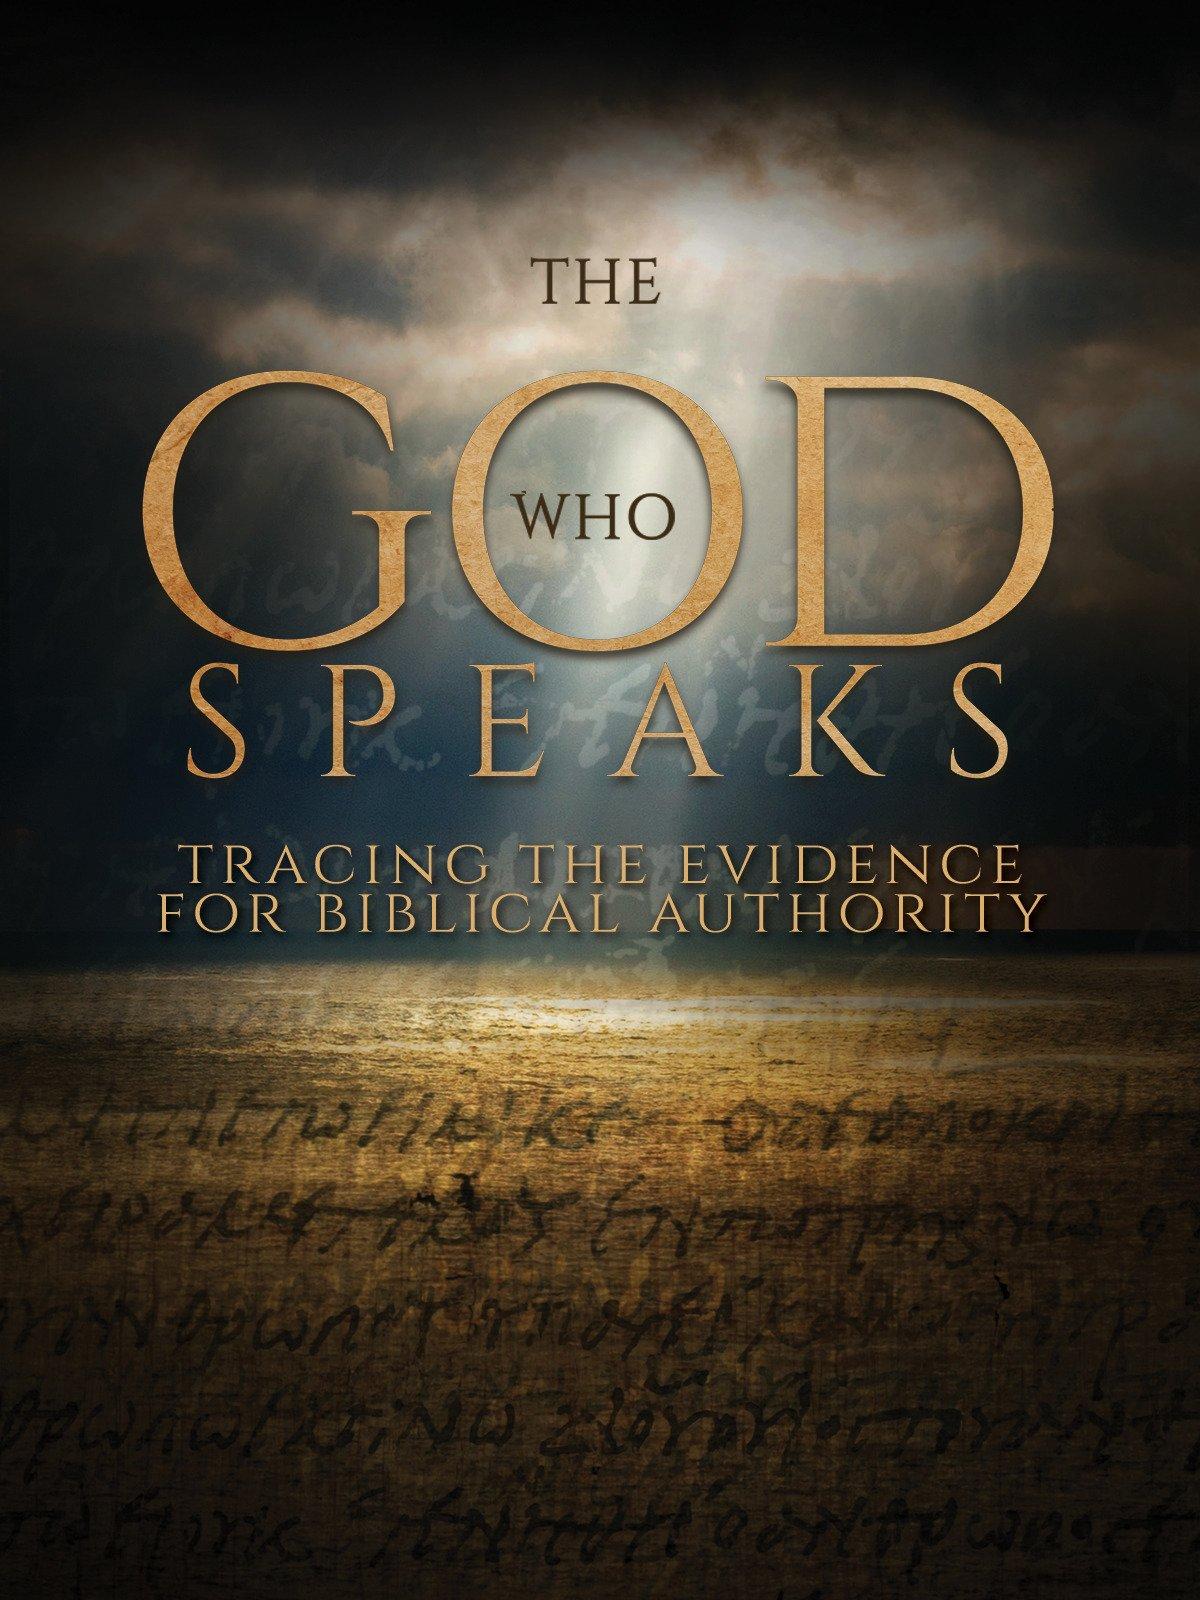 The-God-Who-Speaks